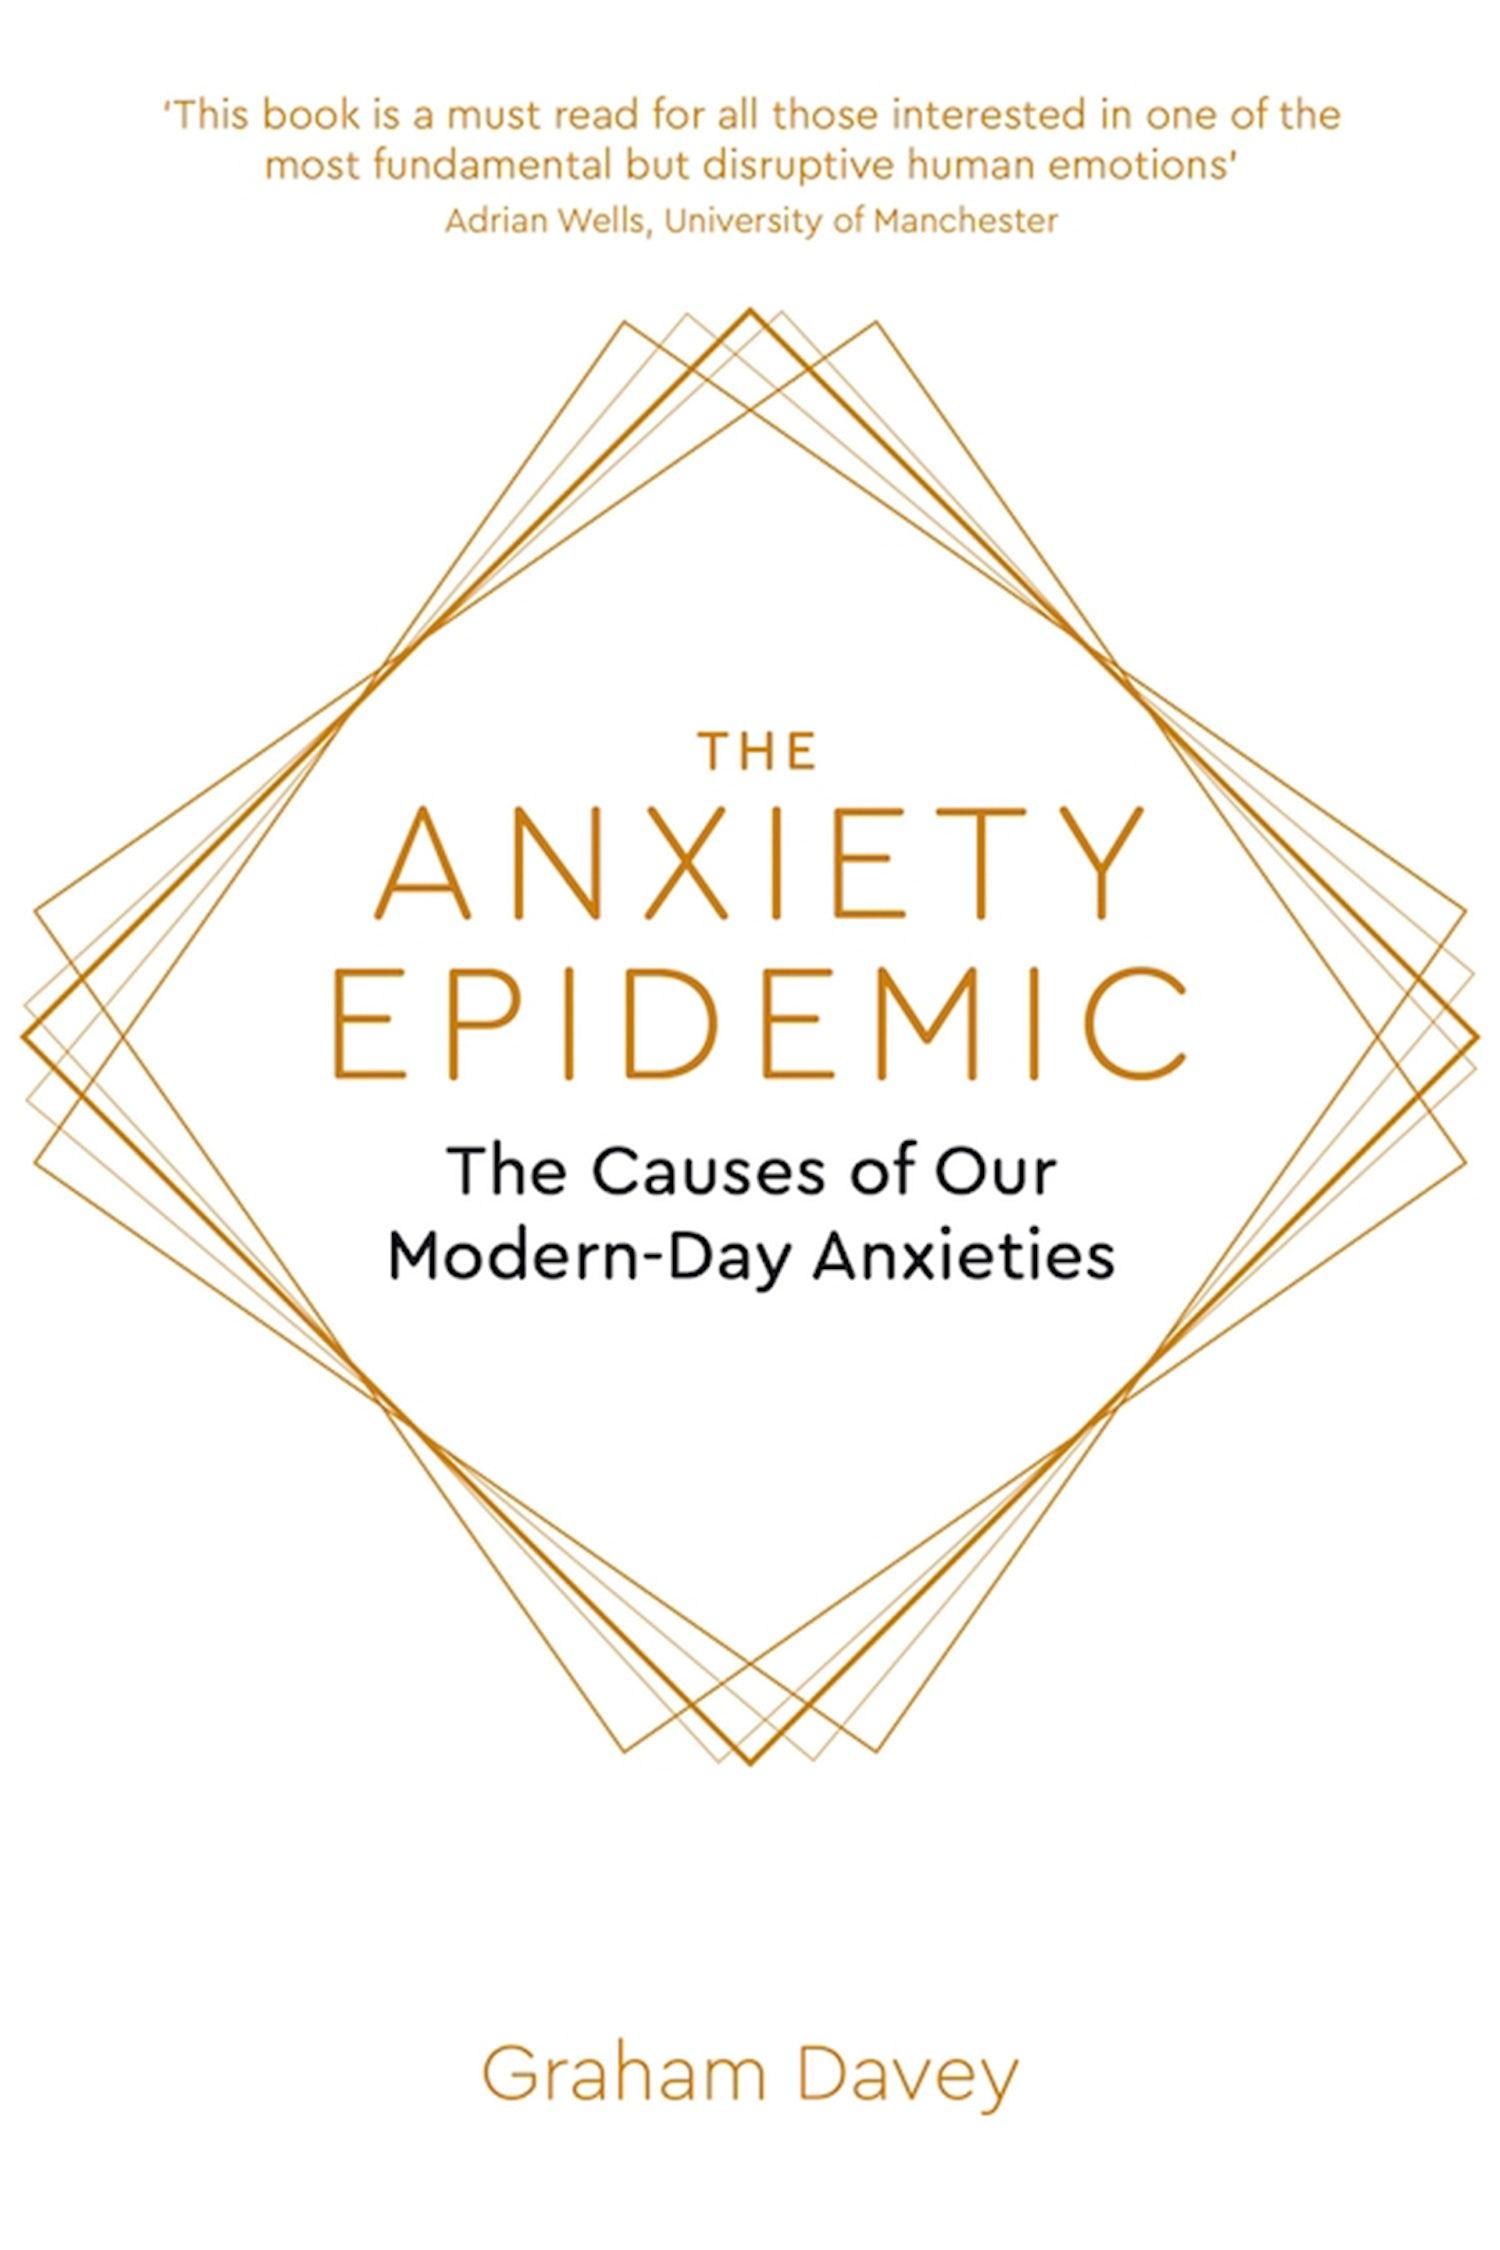 theanxietyepidemicgrahamdavey